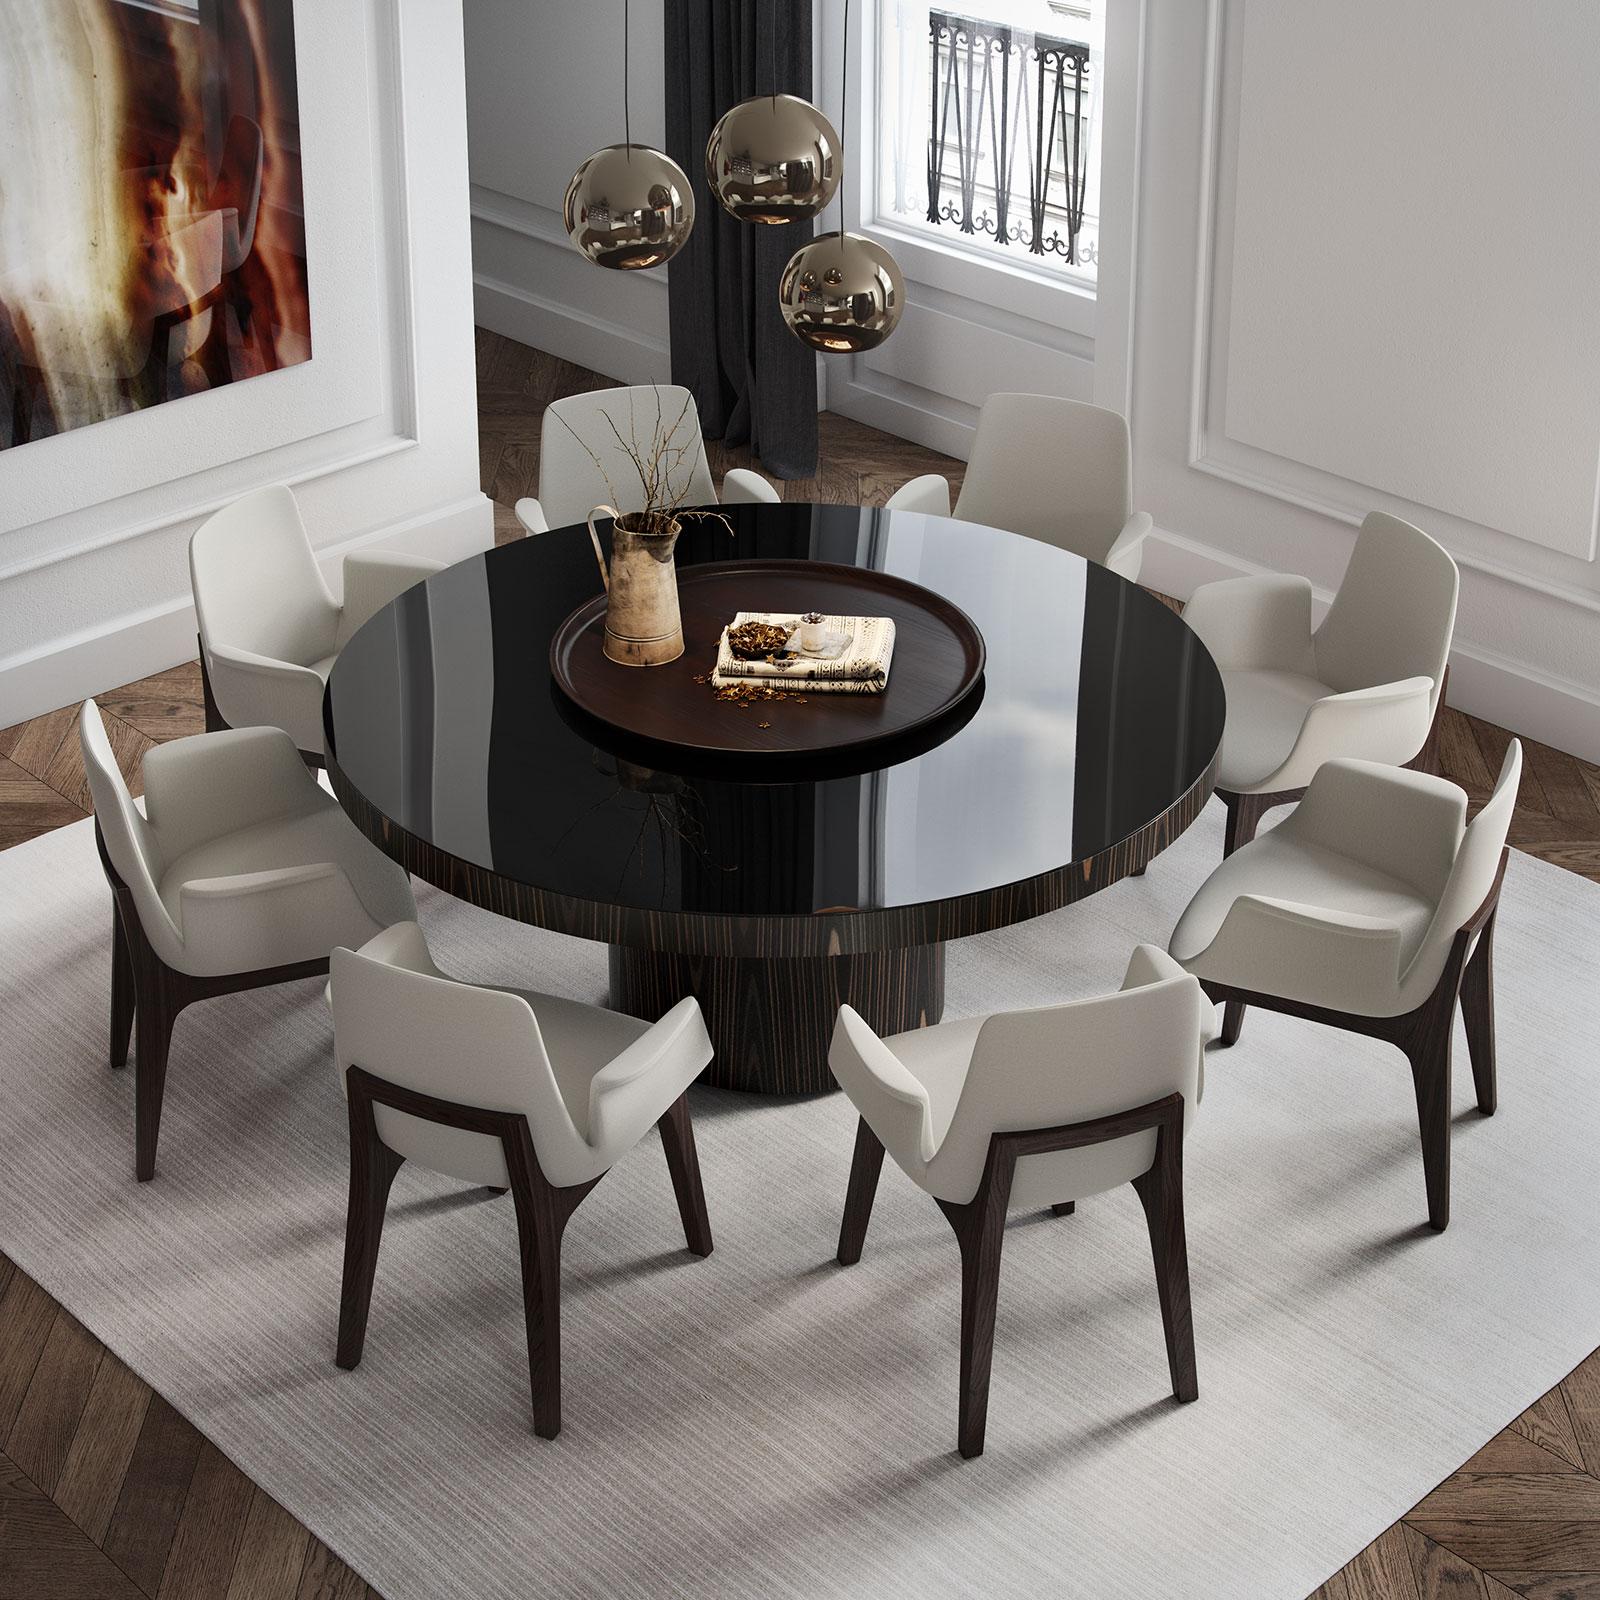 Bimmaloft Dining Tables Berkeley 71in 3 2